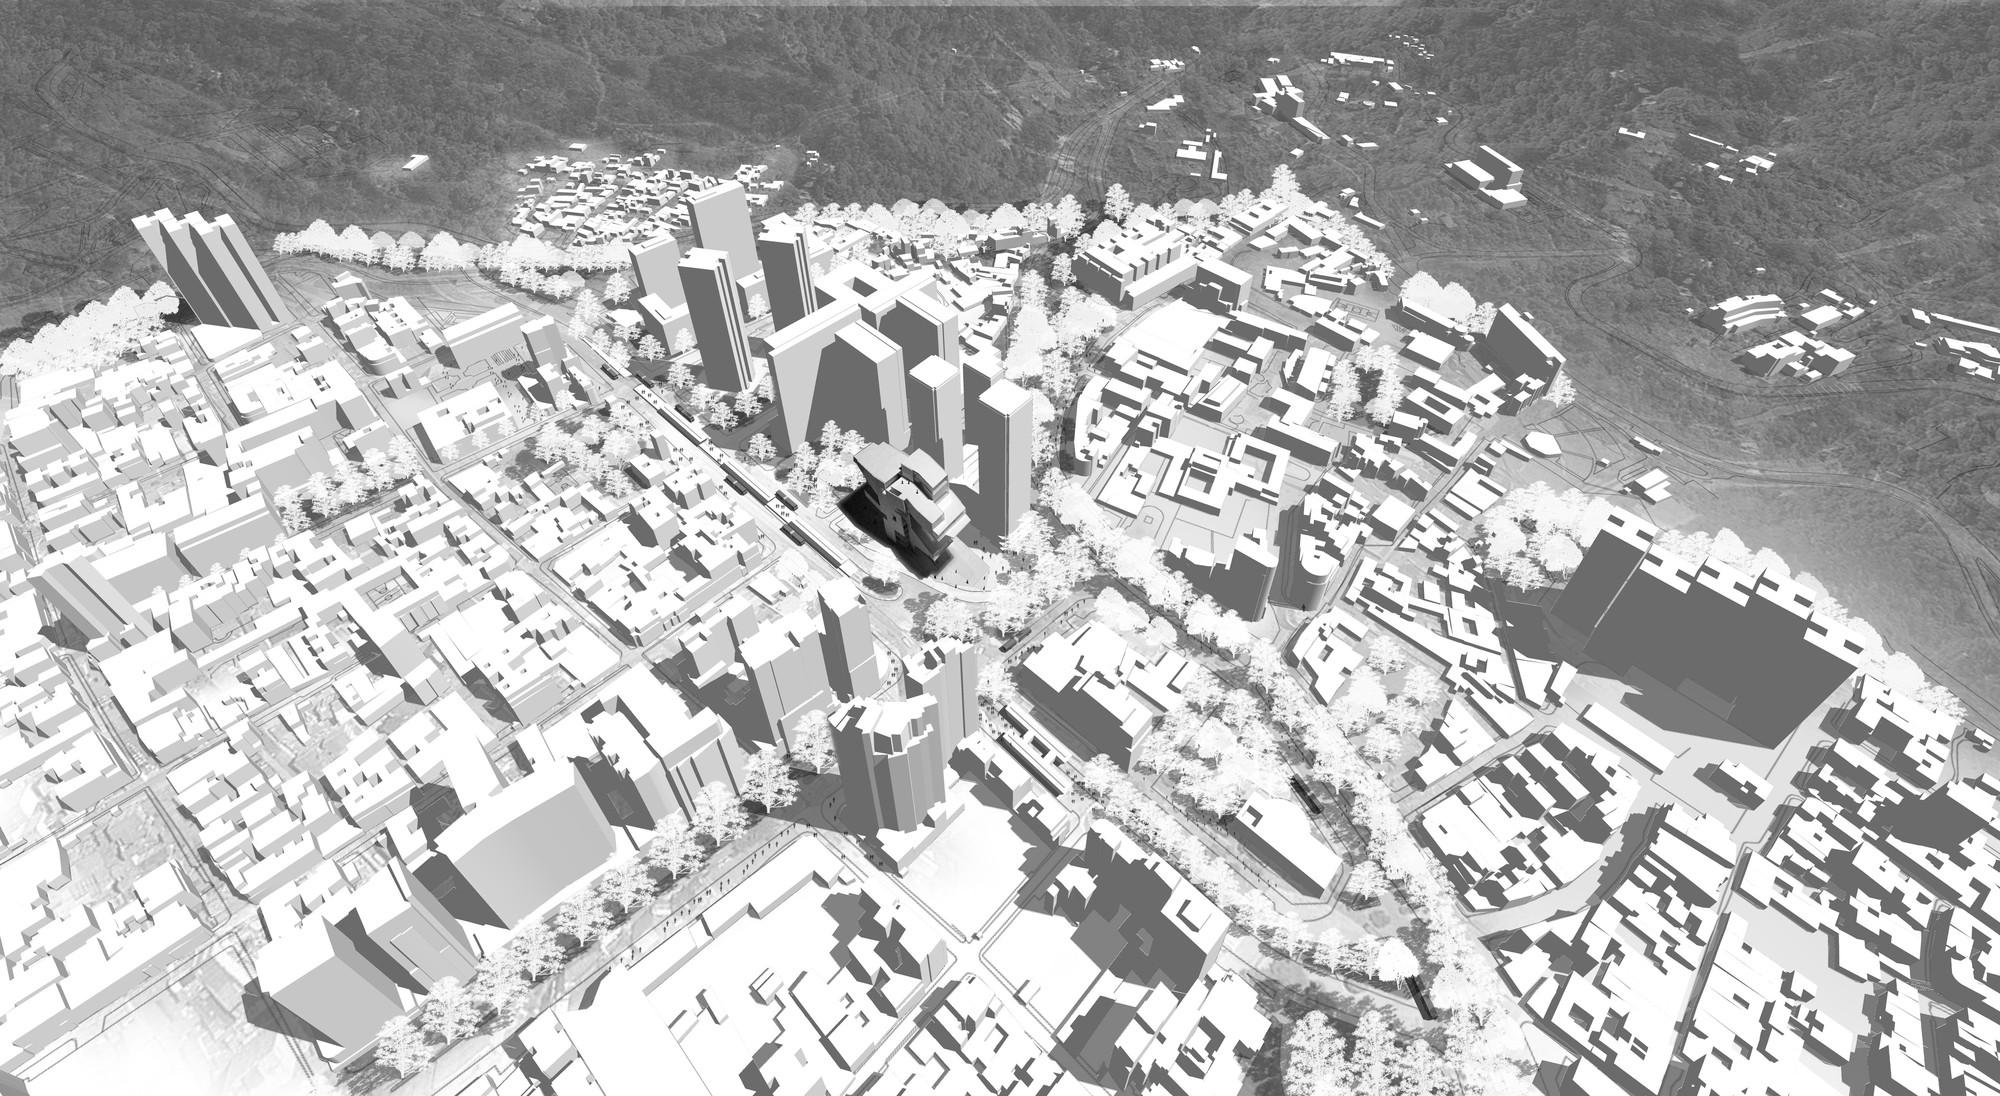 Fondo urbano. Image Cortesia de estudio.entresitio